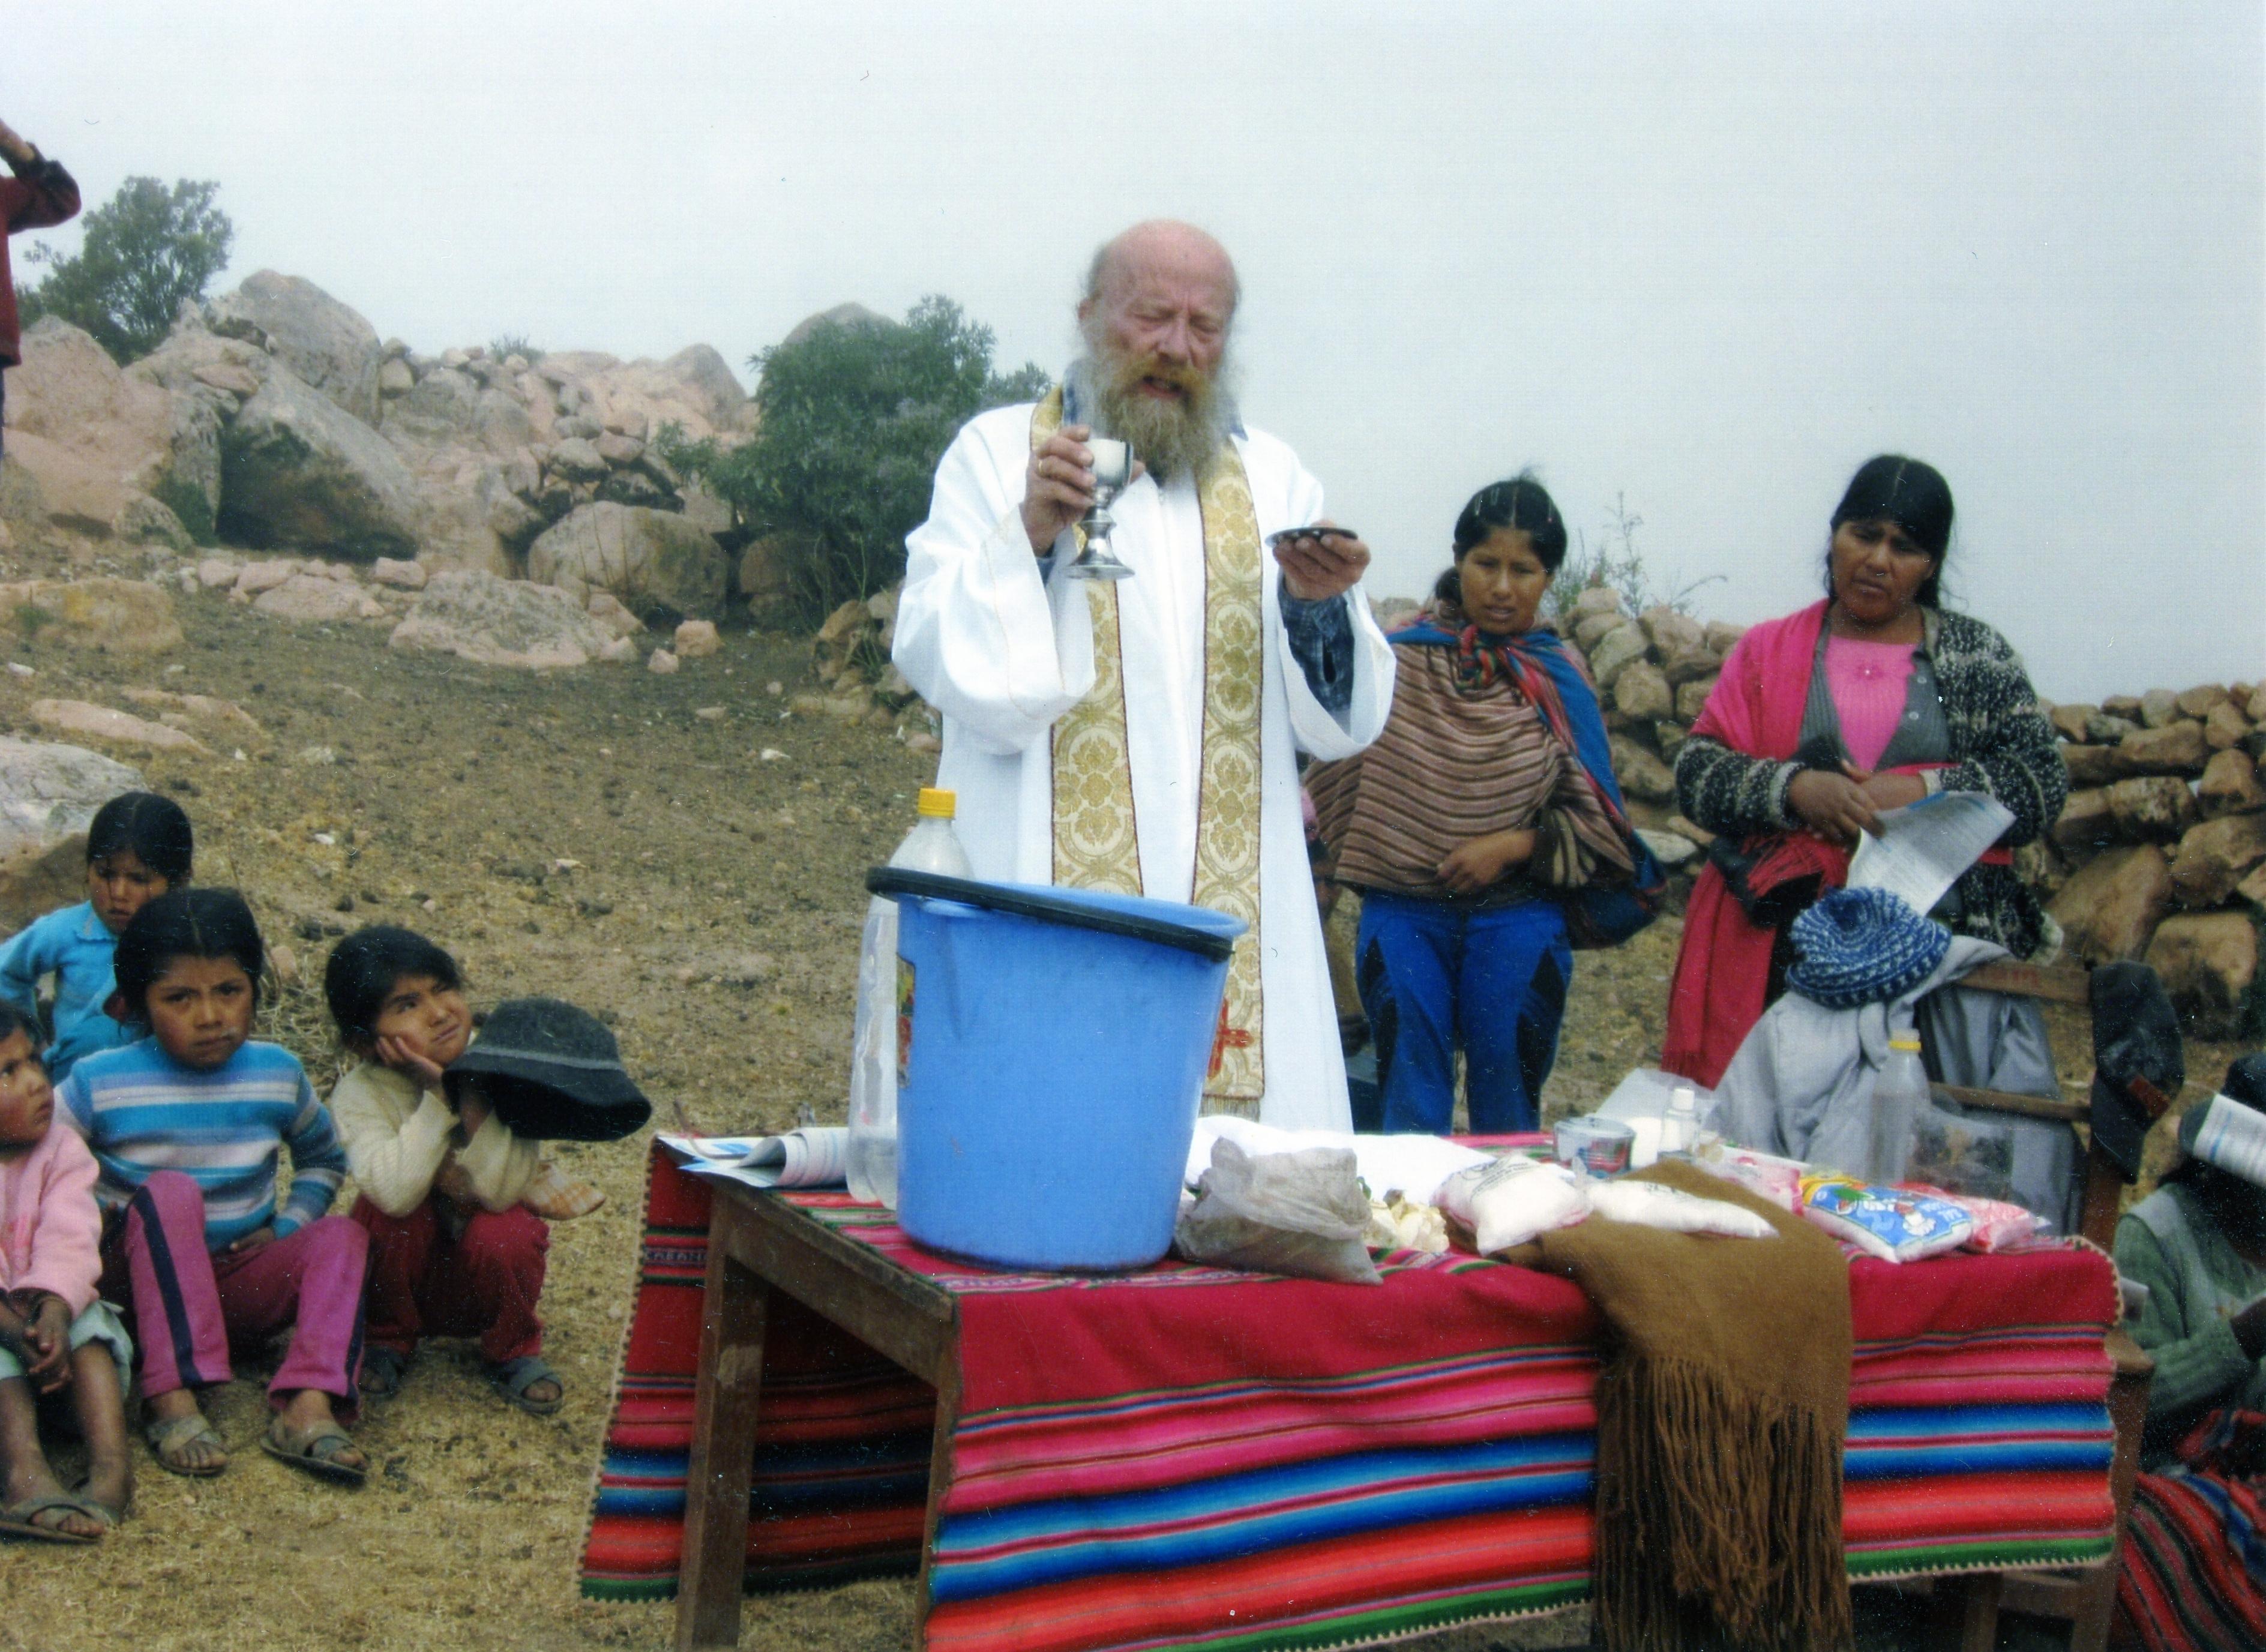 Media Release - Covid-19 Spiritual bouquet